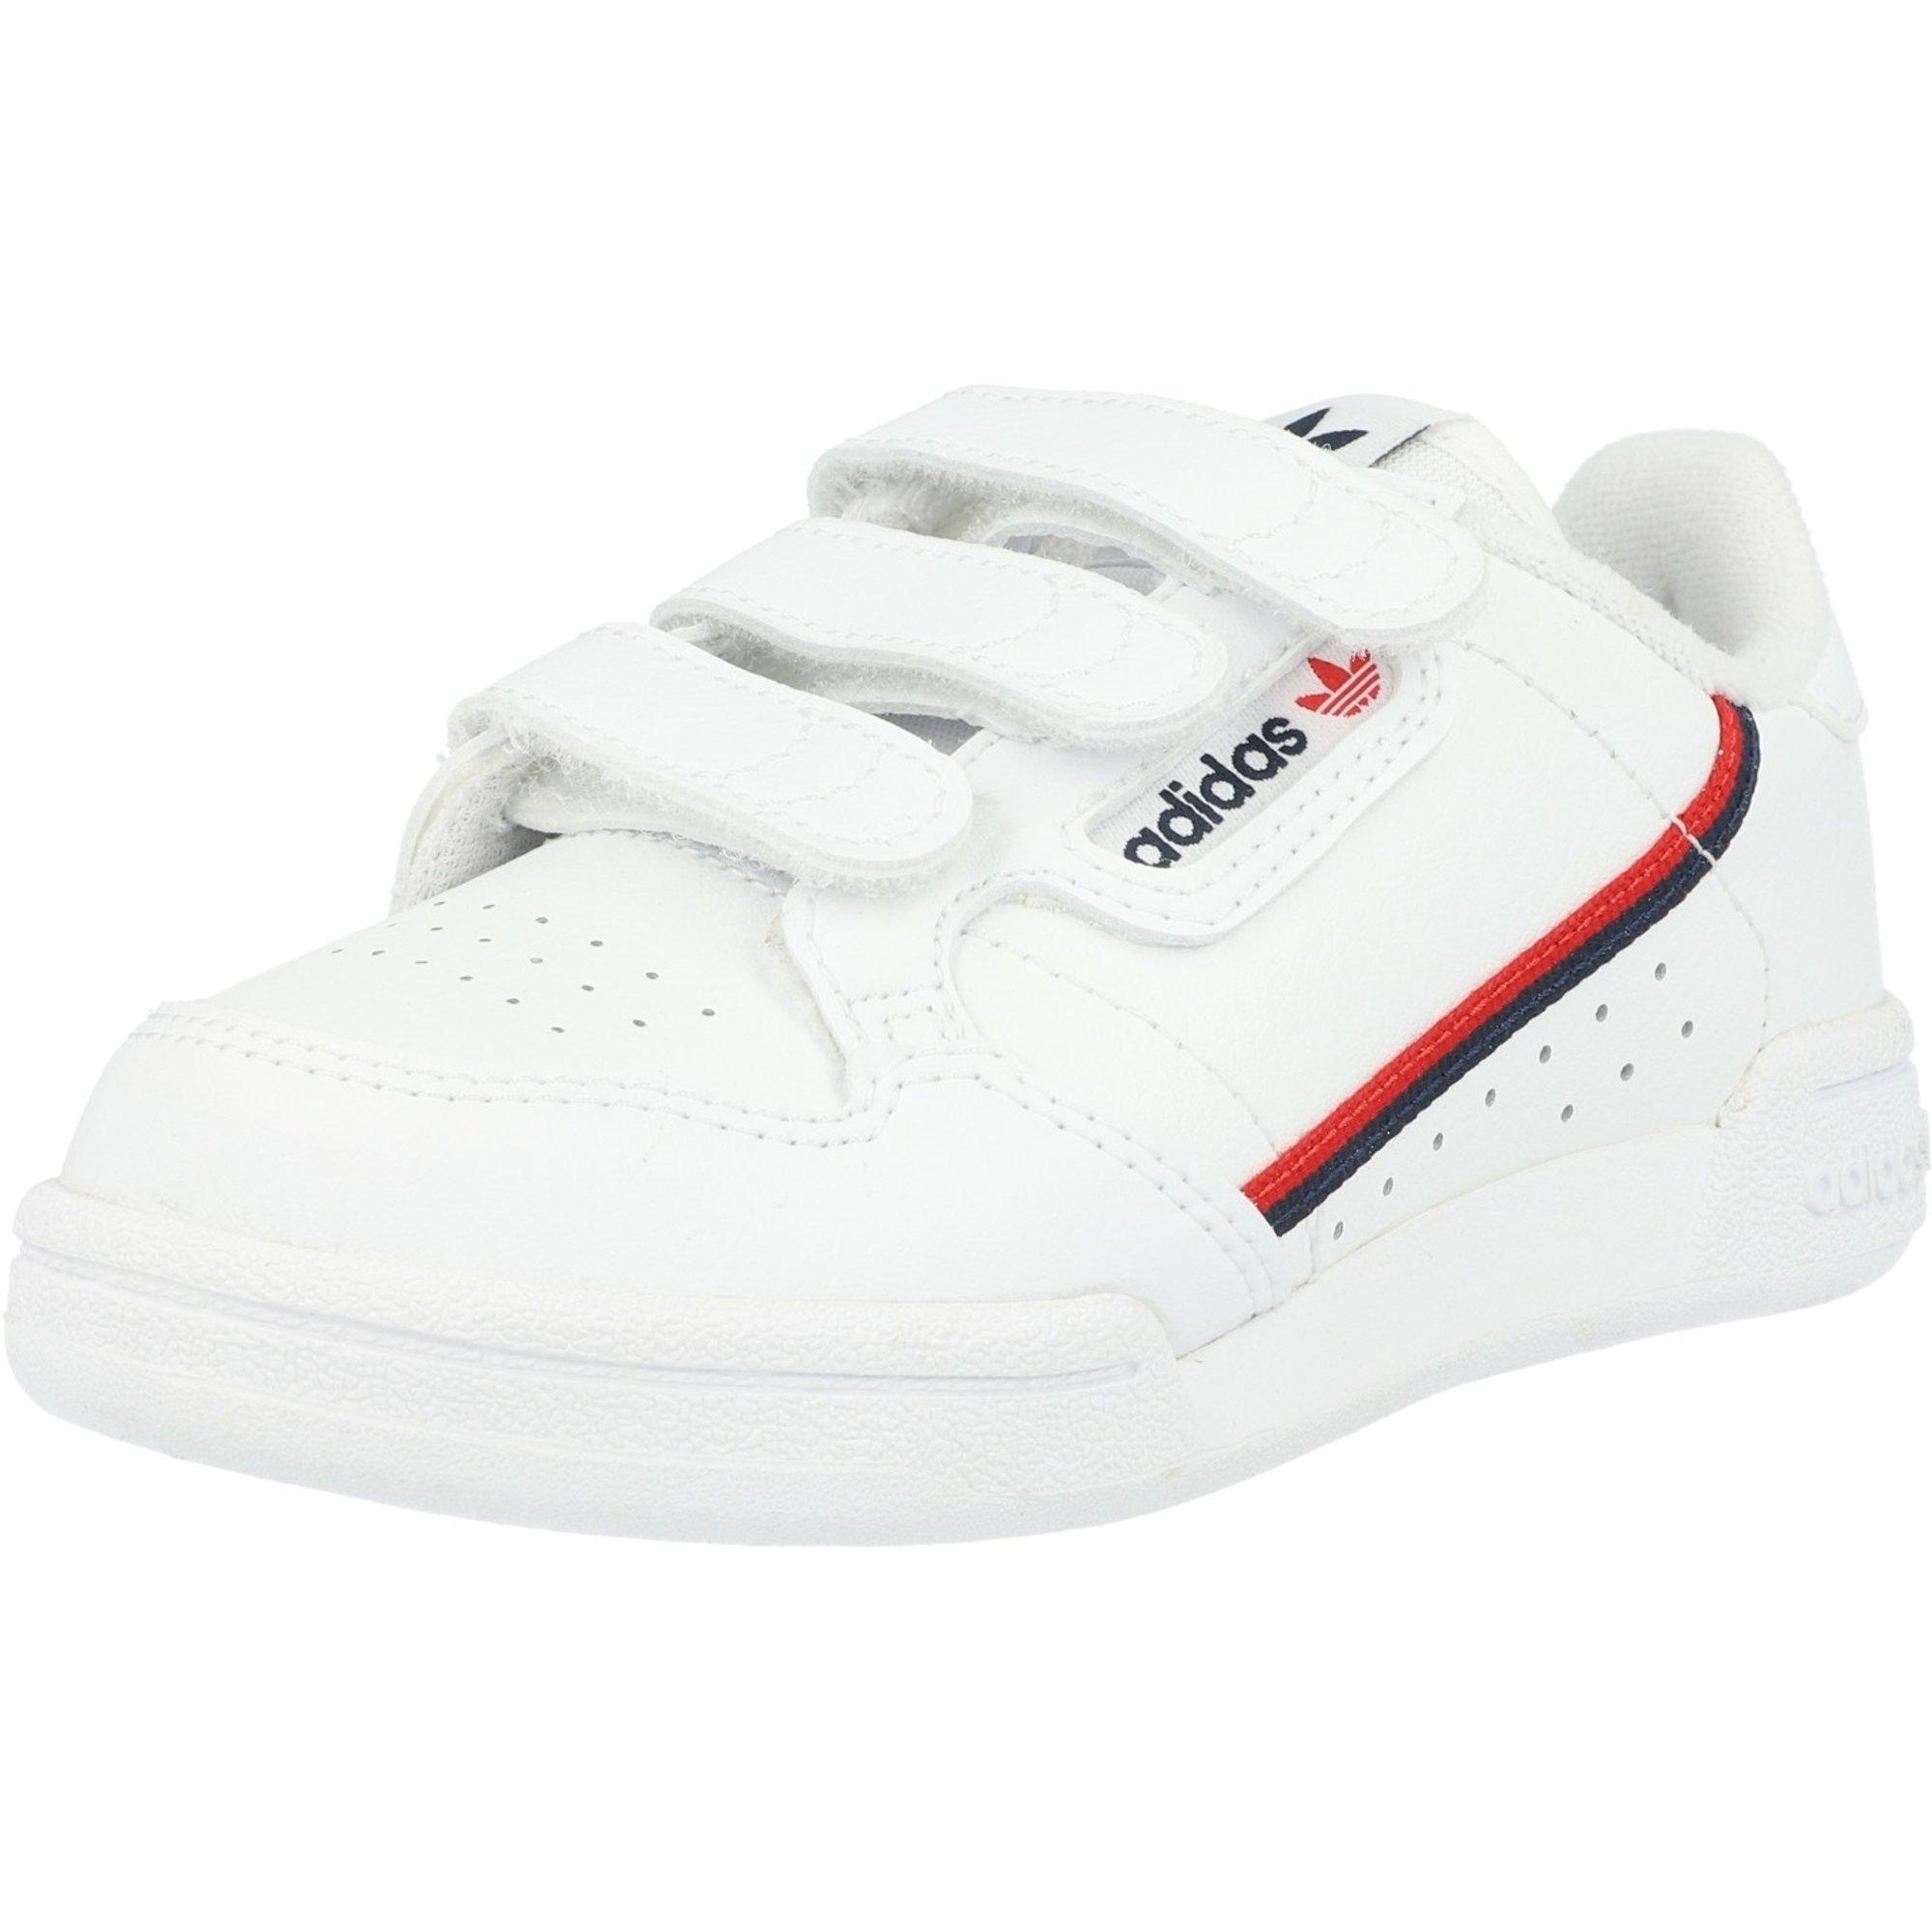 adidas us größe 10 crocs